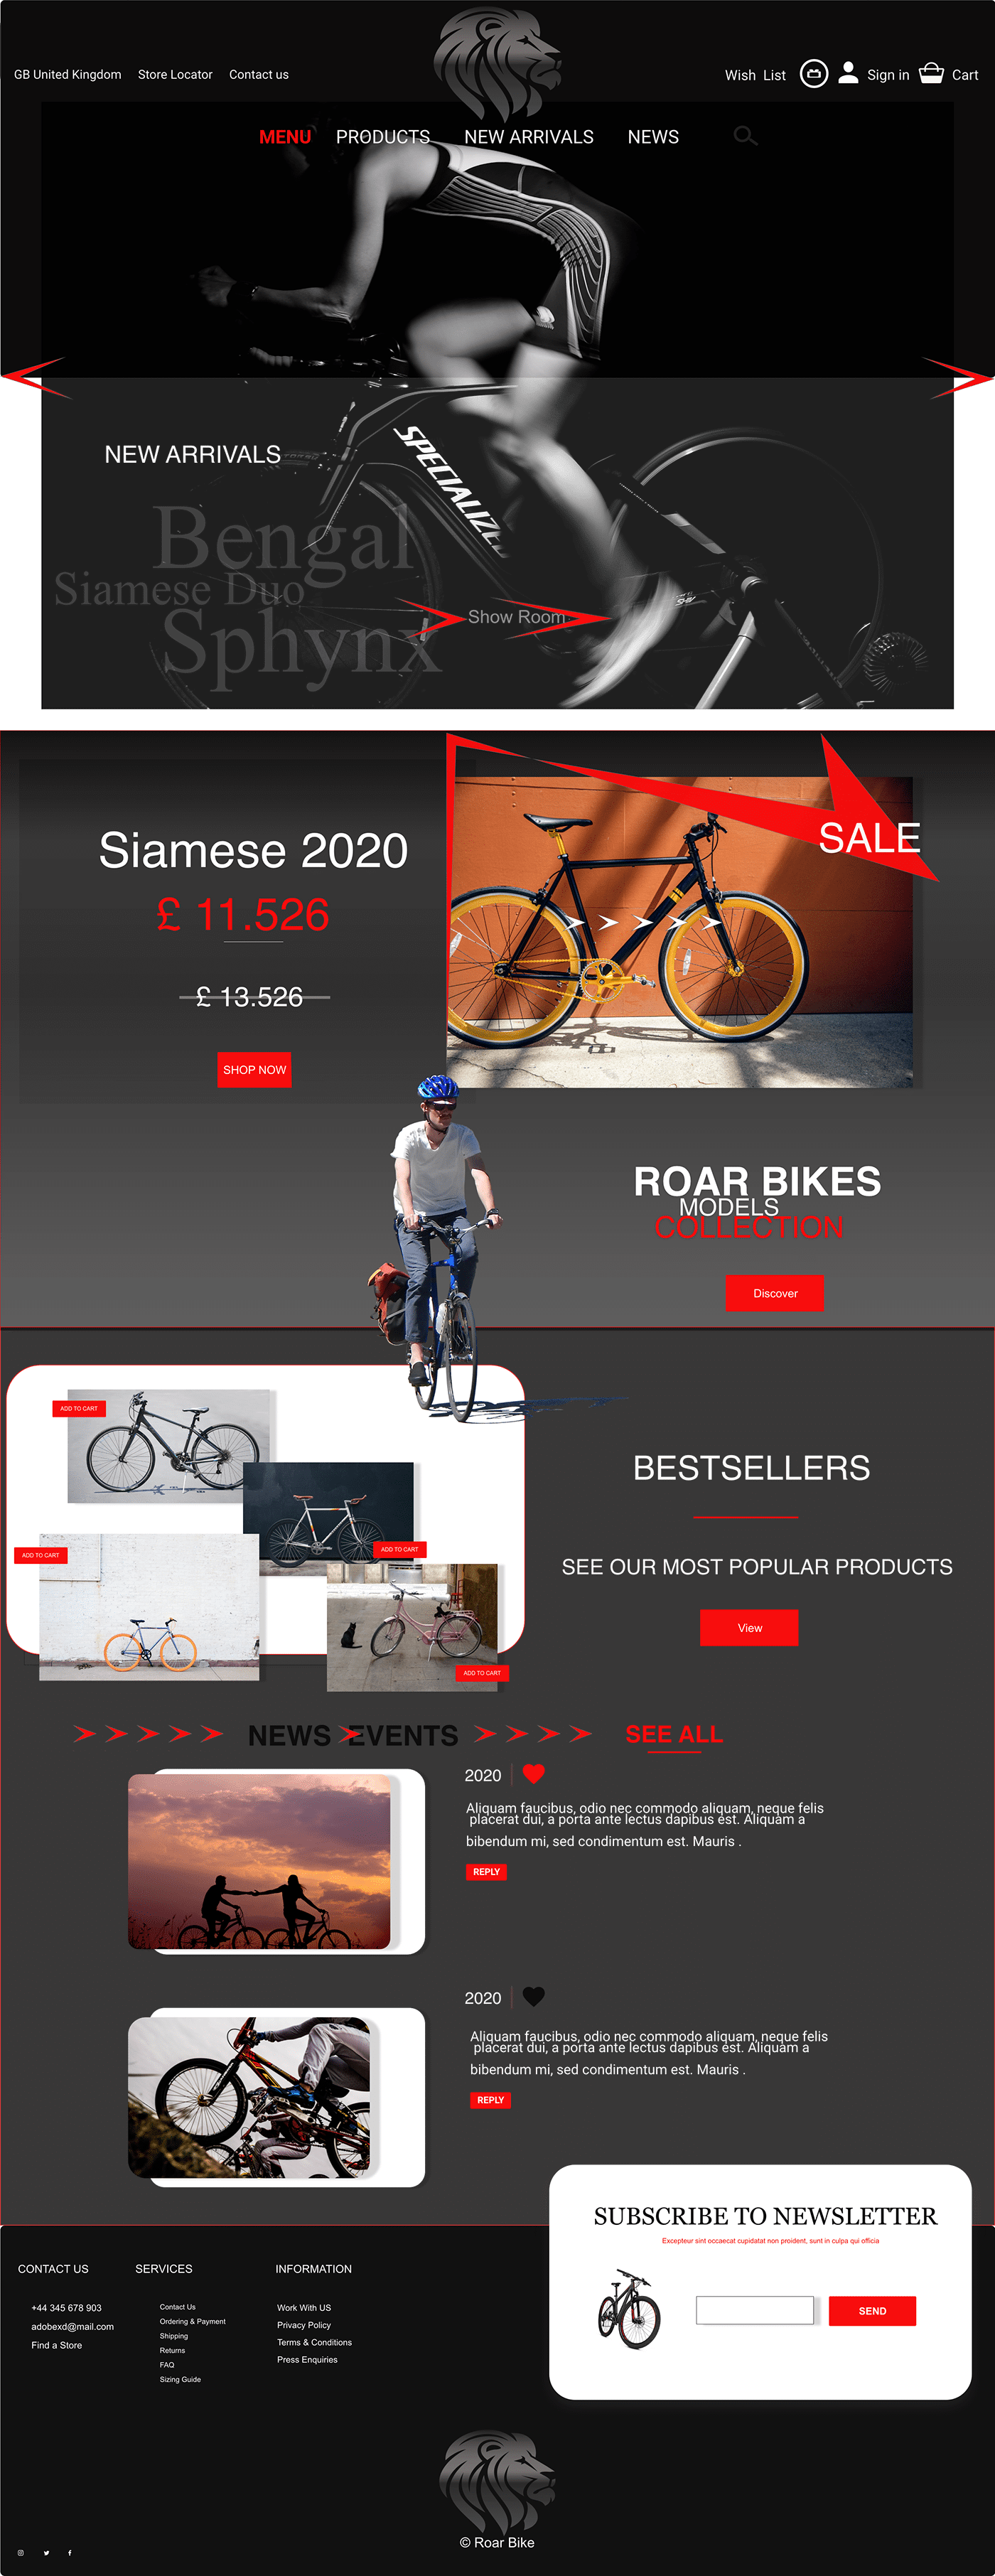 Bike design e-commerce UI/UX